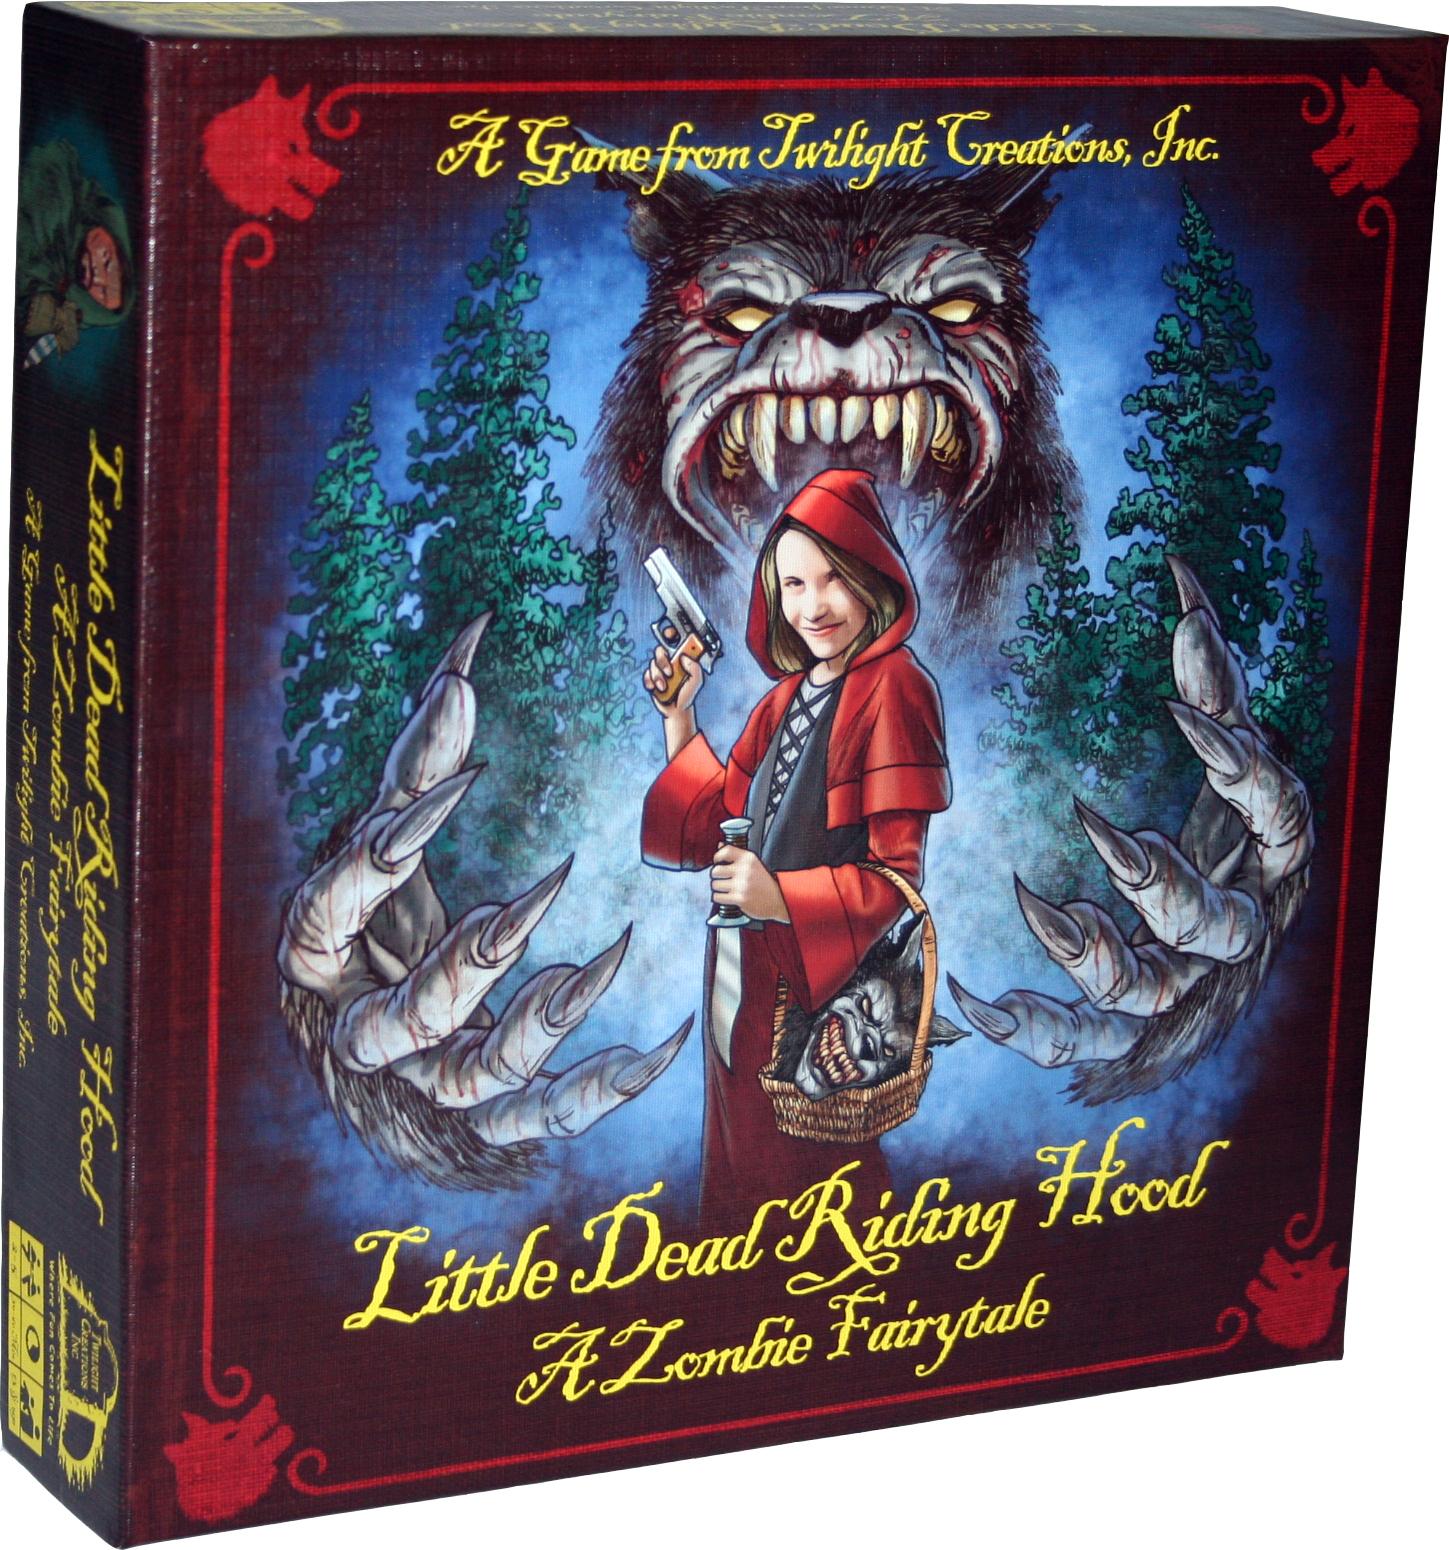 Little Dead Riding Hood Box Front